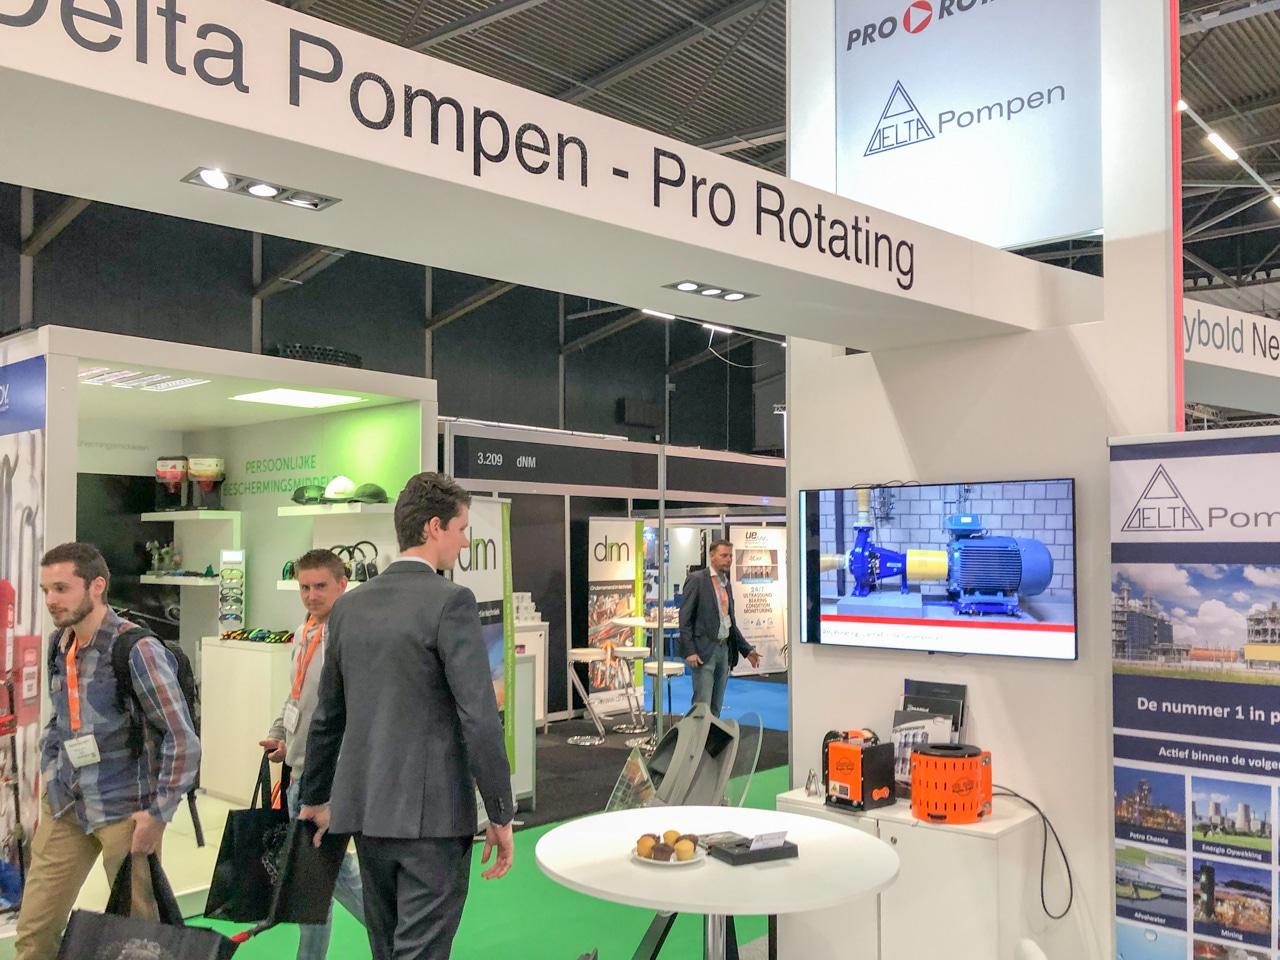 Delta Pompen Presenting Uniguard Machine Guards at Maintenance NEXT Expo